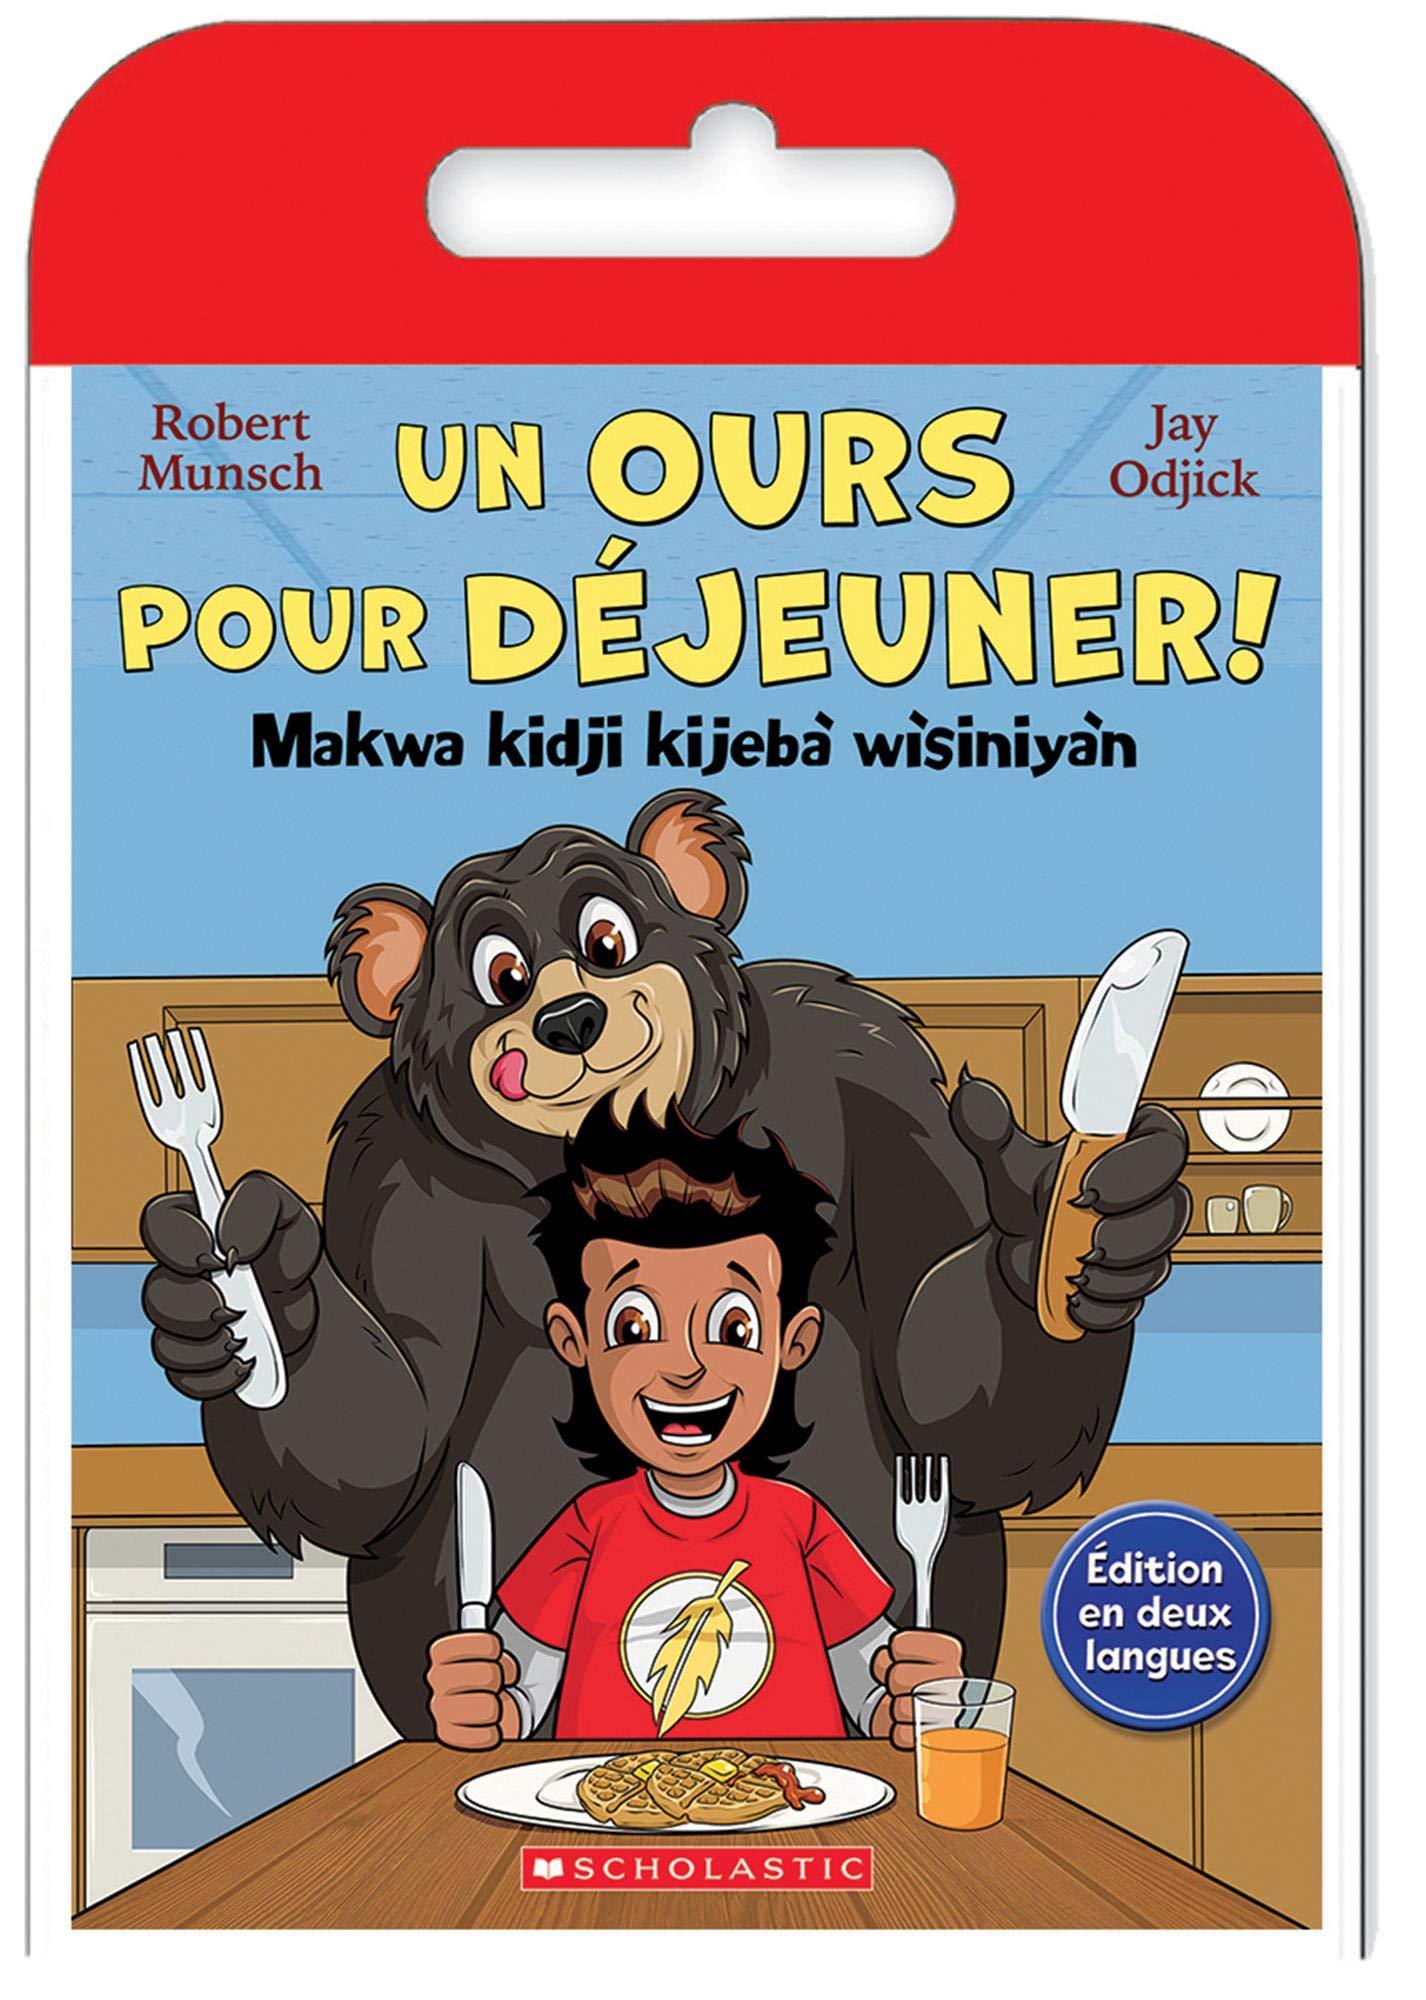 Un ours pour déjeuner! = Makwa kidji kijebà wìsiniyàn